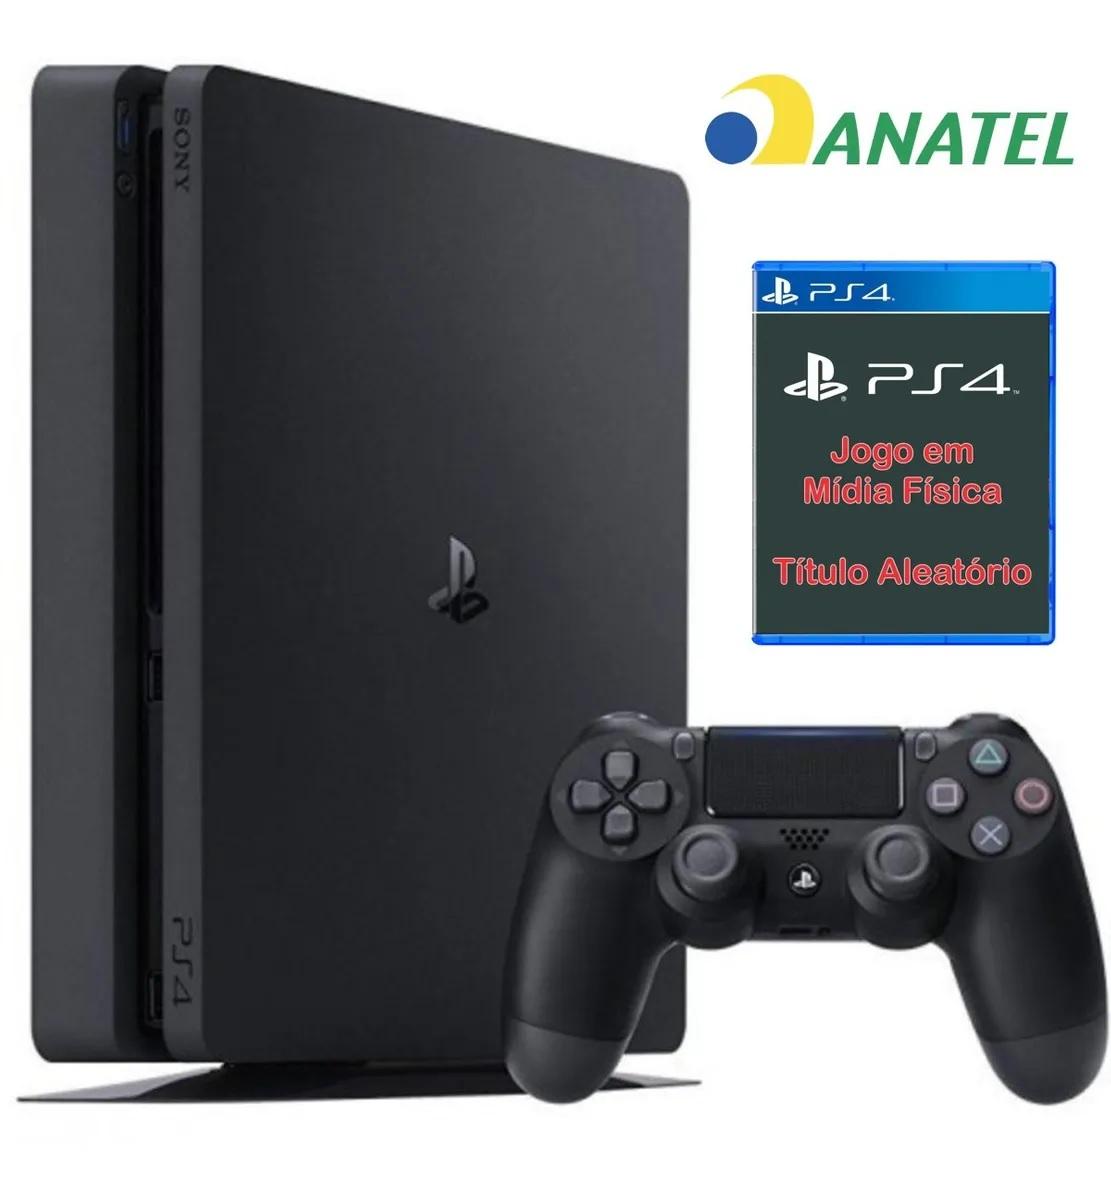 PlayStation 4 500 Gb Slim Seminovo com Brinde